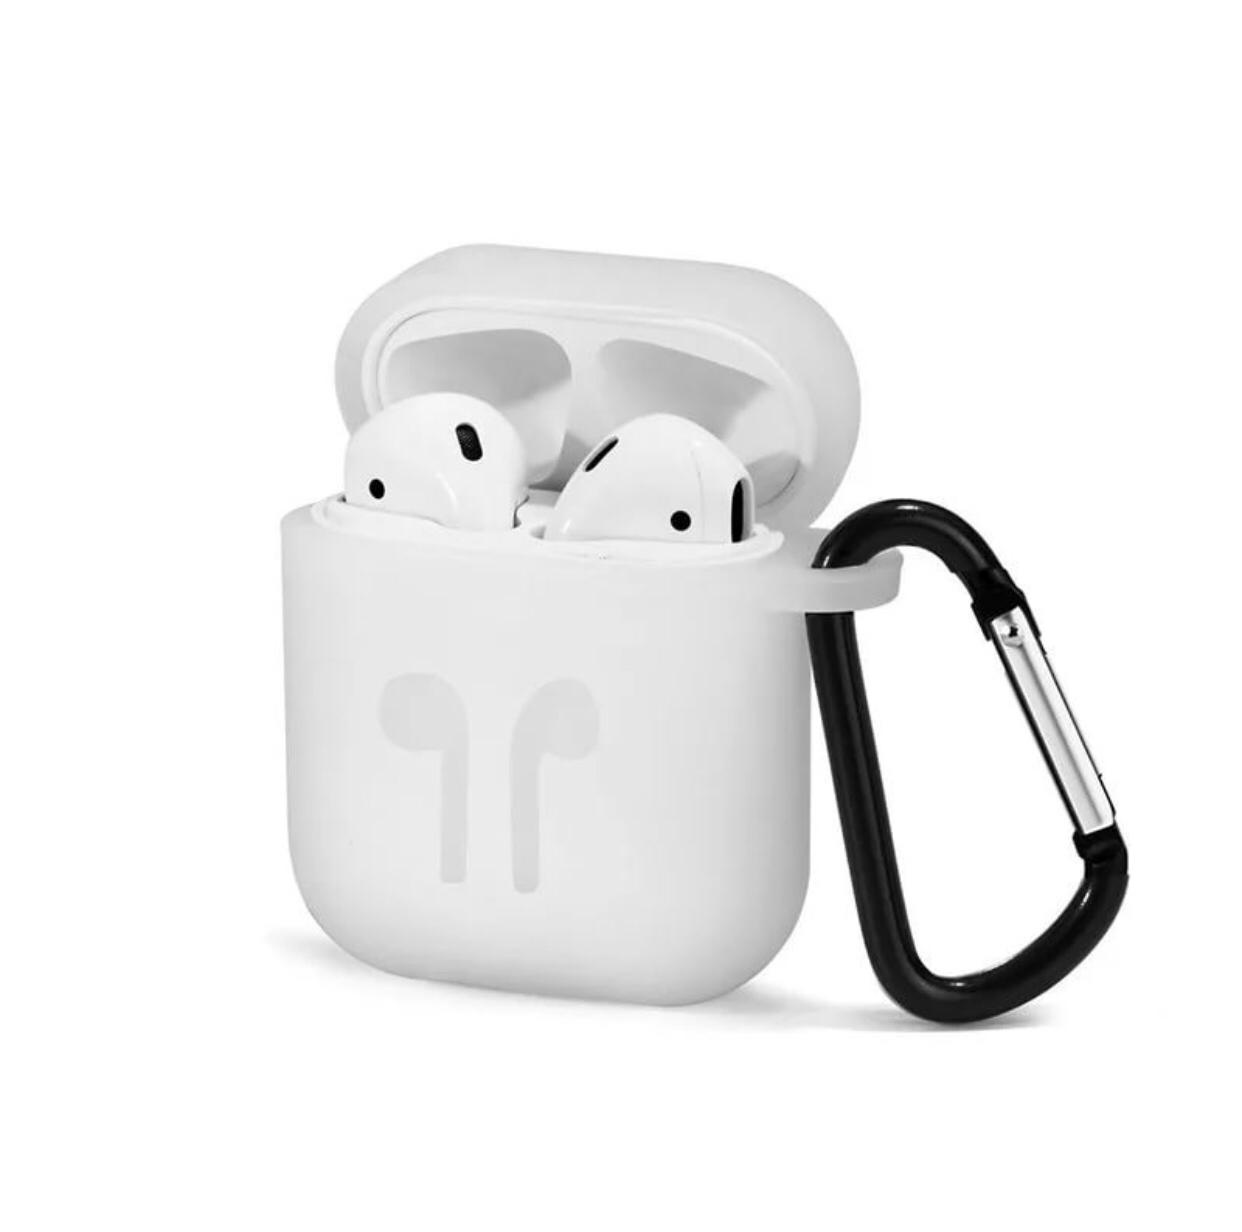 Чехол для наушников Markclub@Hoco Apple AirPods, белый